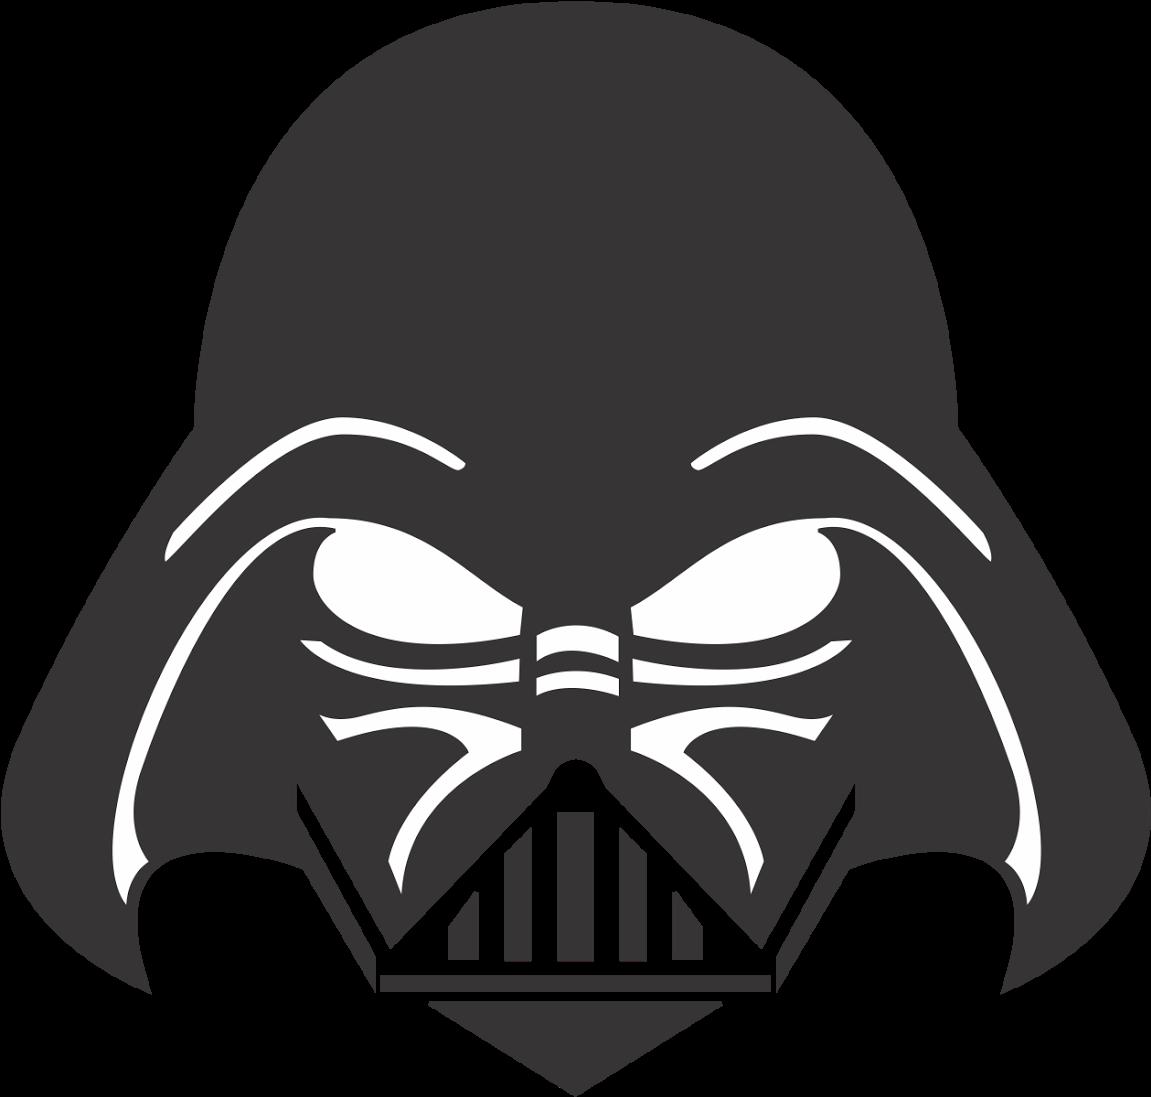 Darth vader clipart drath. Stormtrooper death star wars